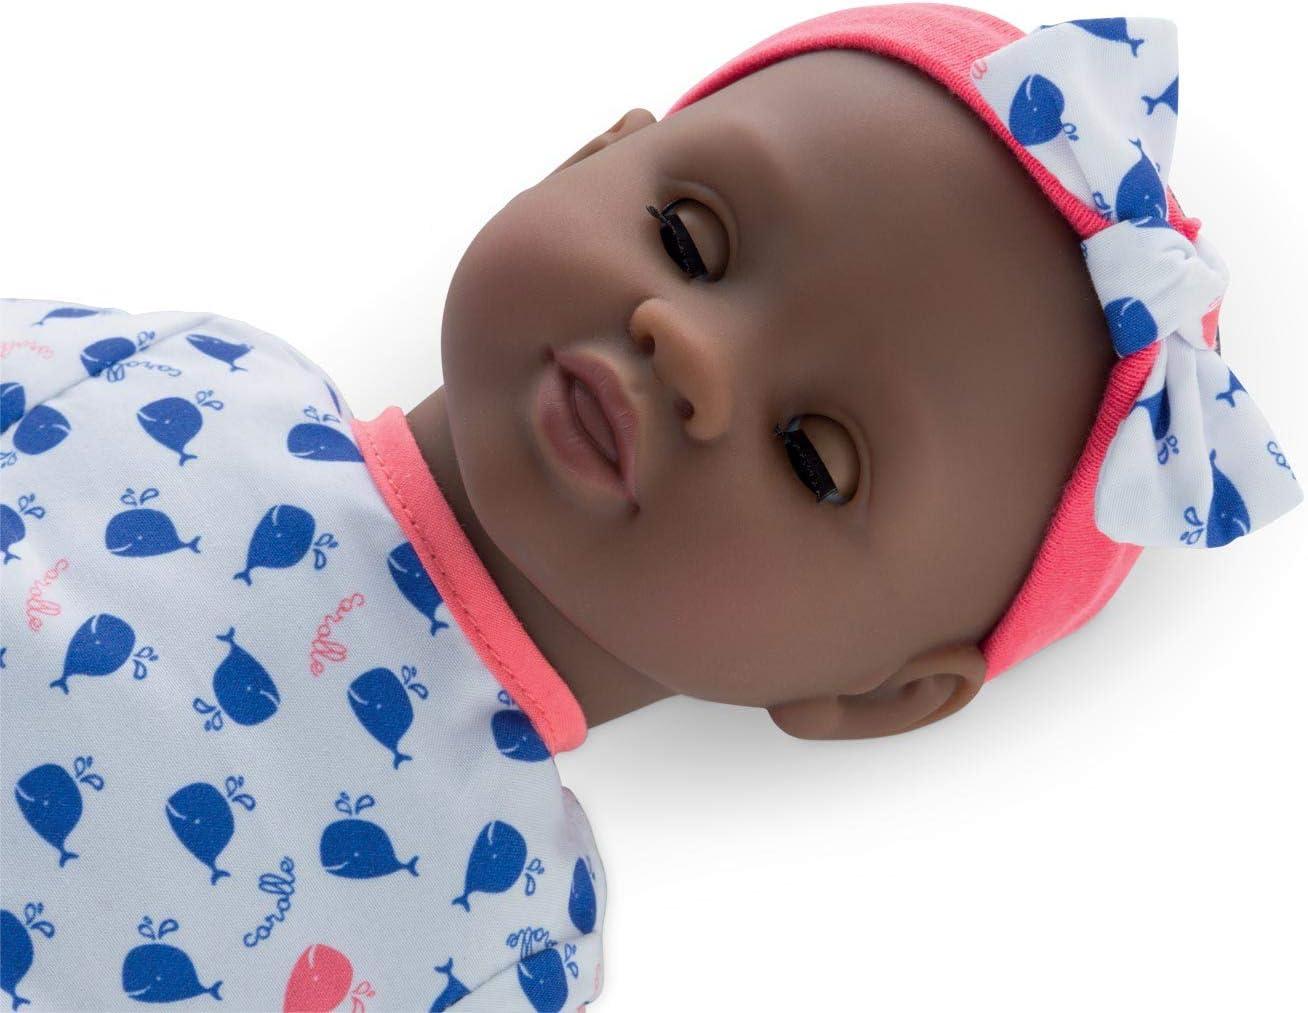 Le remplissage Black Baby Body vider